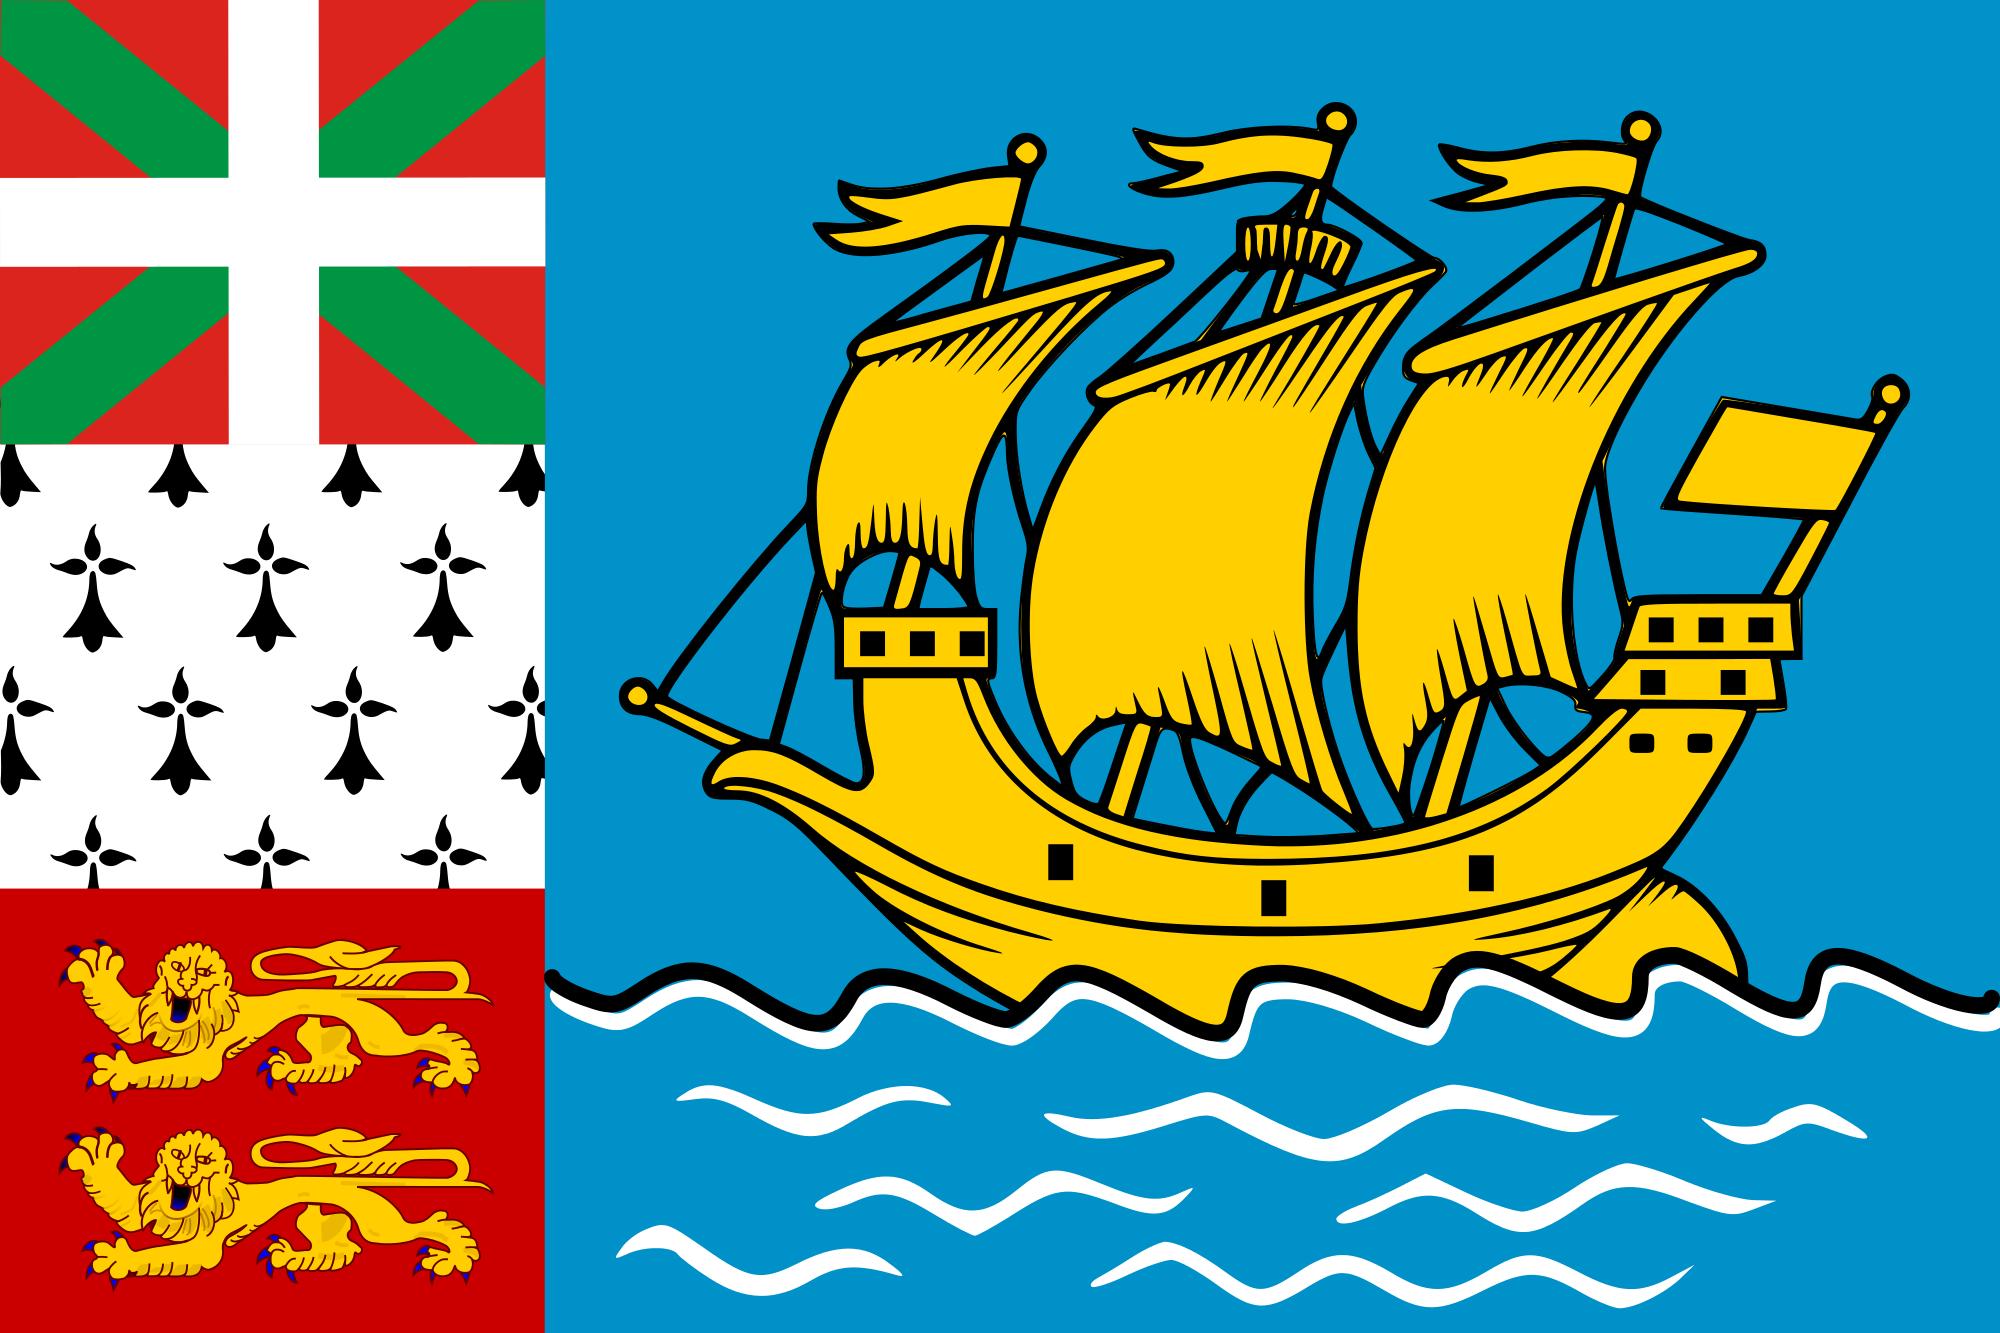 Saint Pierre e miquelon, país, Brasão de armas, logotipo, símbolo - Papéis de parede HD - Professor-falken.com